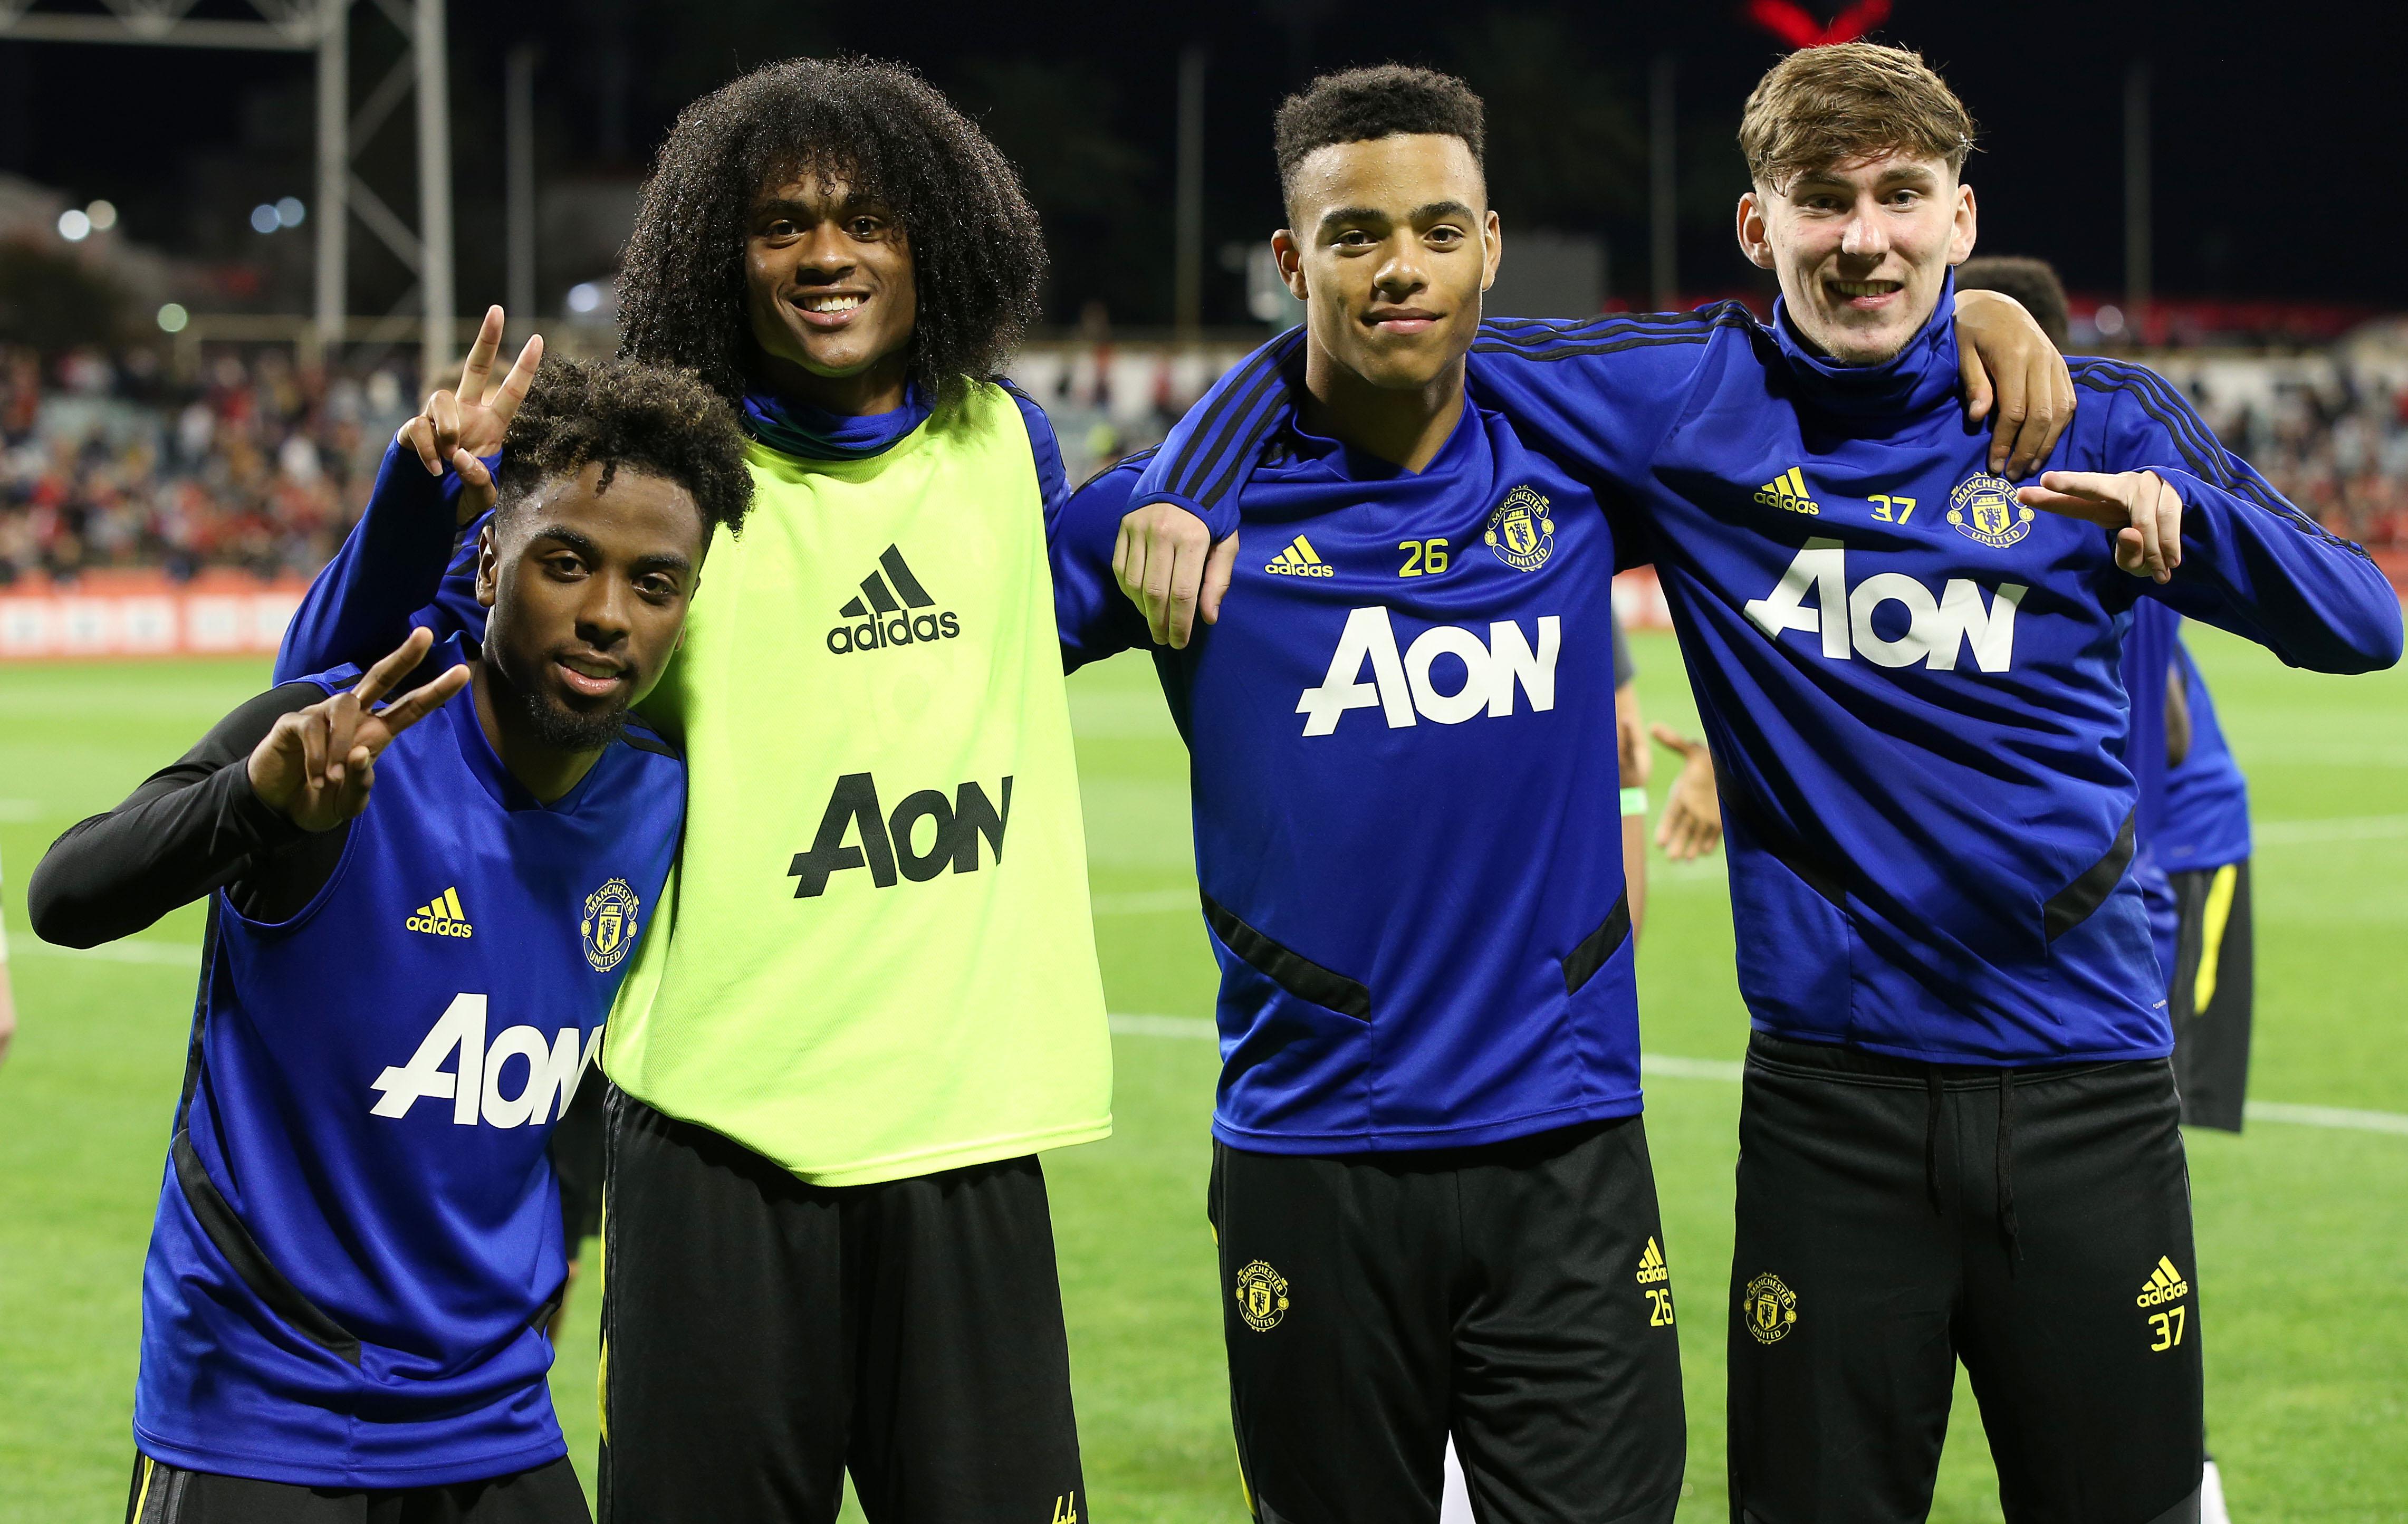 Manchester United Pre-Season Tour - Day 4